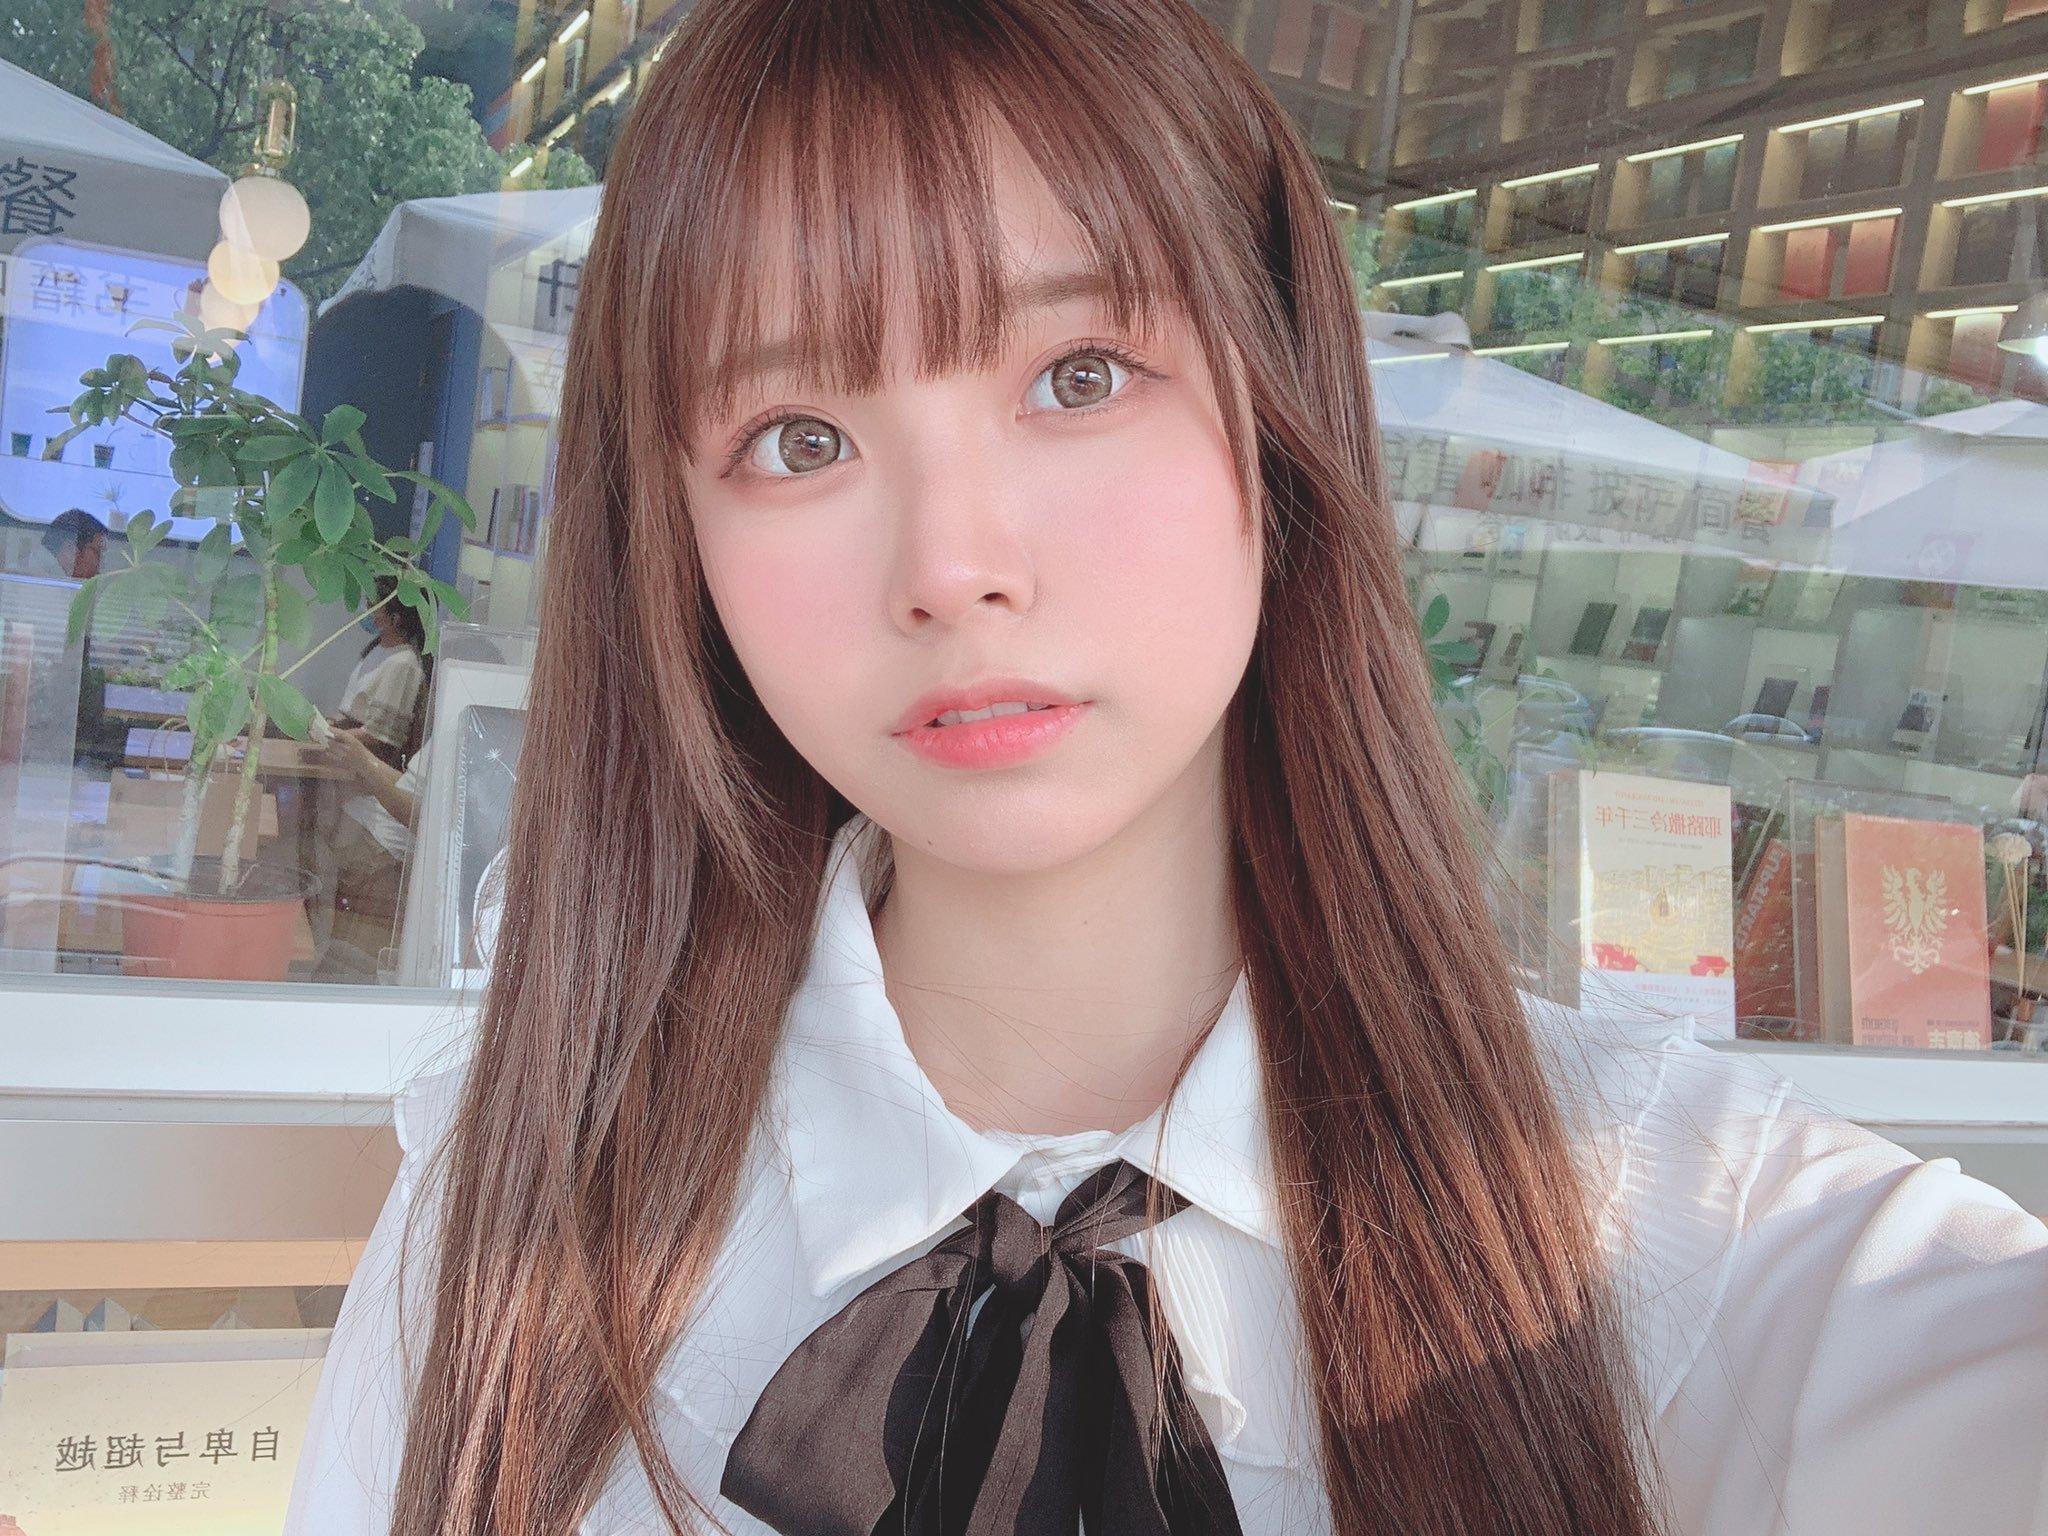 Cosplay 辉夜到藤原一人扮演-Liyuu - 爱弹幕 iDanMu.com